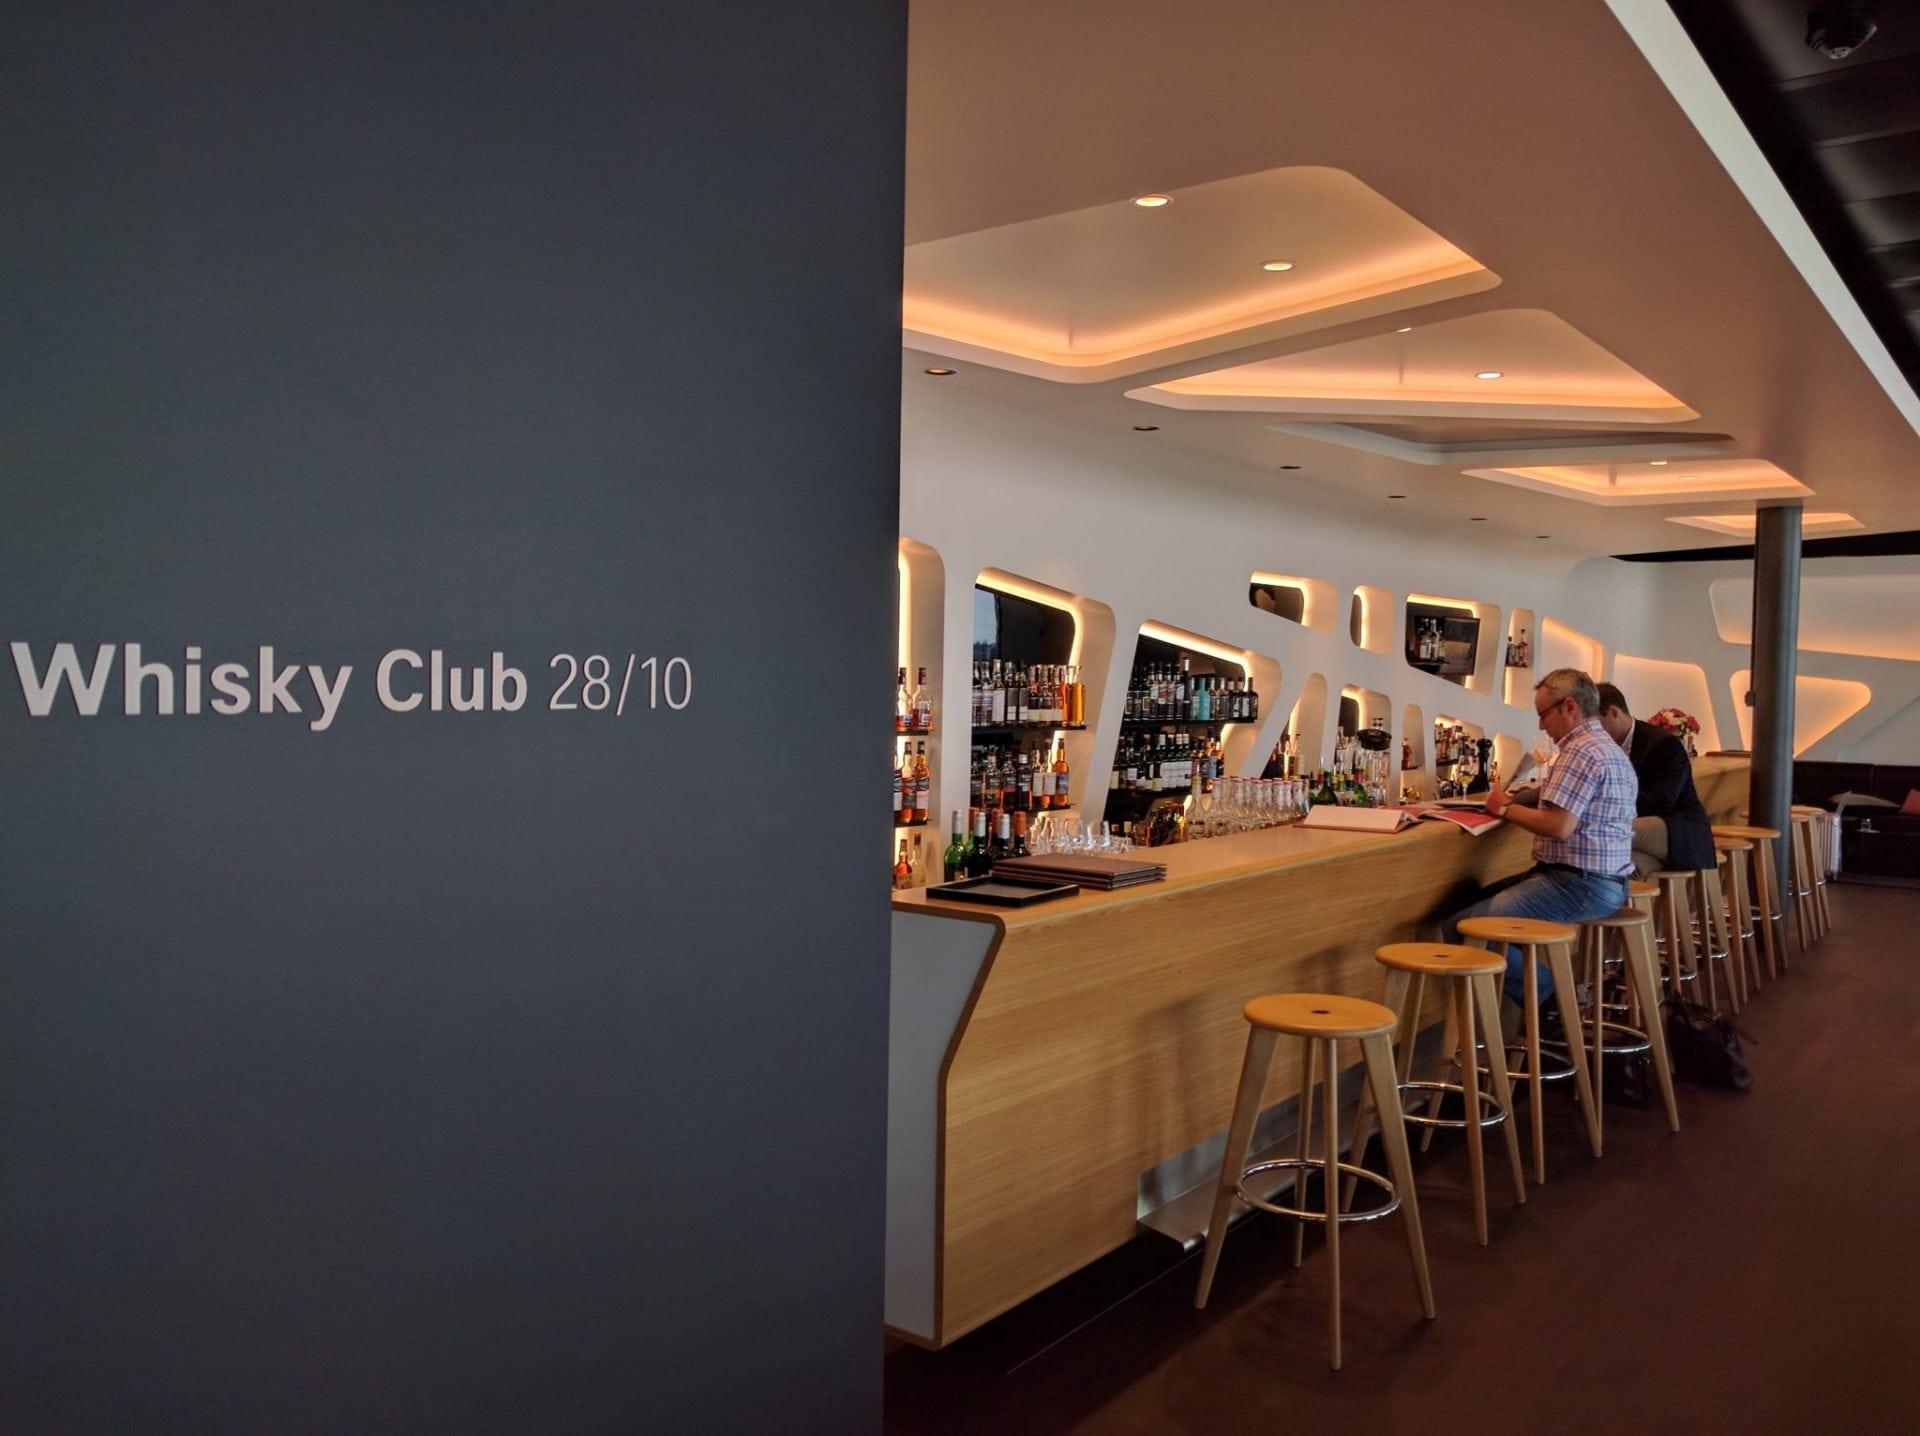 Swiss Senator Lounge Zürich E Whisky Club